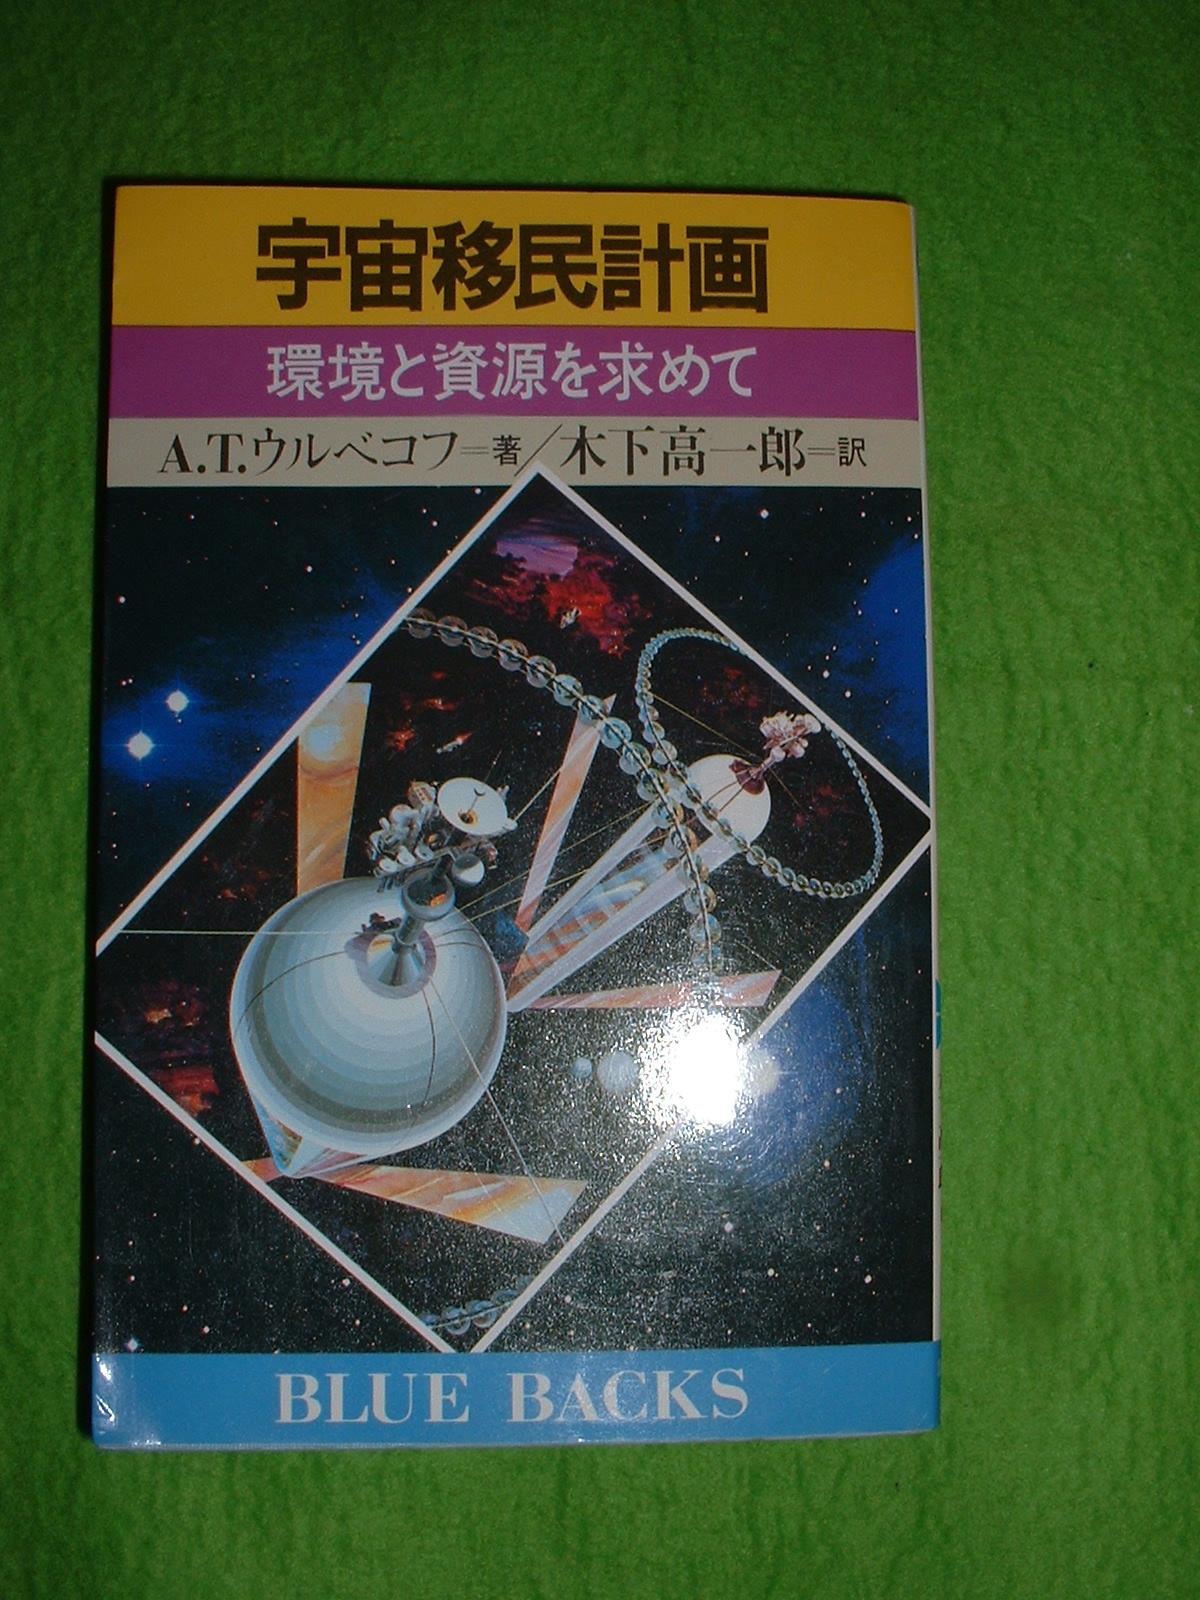 A.T.ウルベコフ 著 「宇宙移民計画 環境と資源を求めて」 Doburoku-TAO.JPG